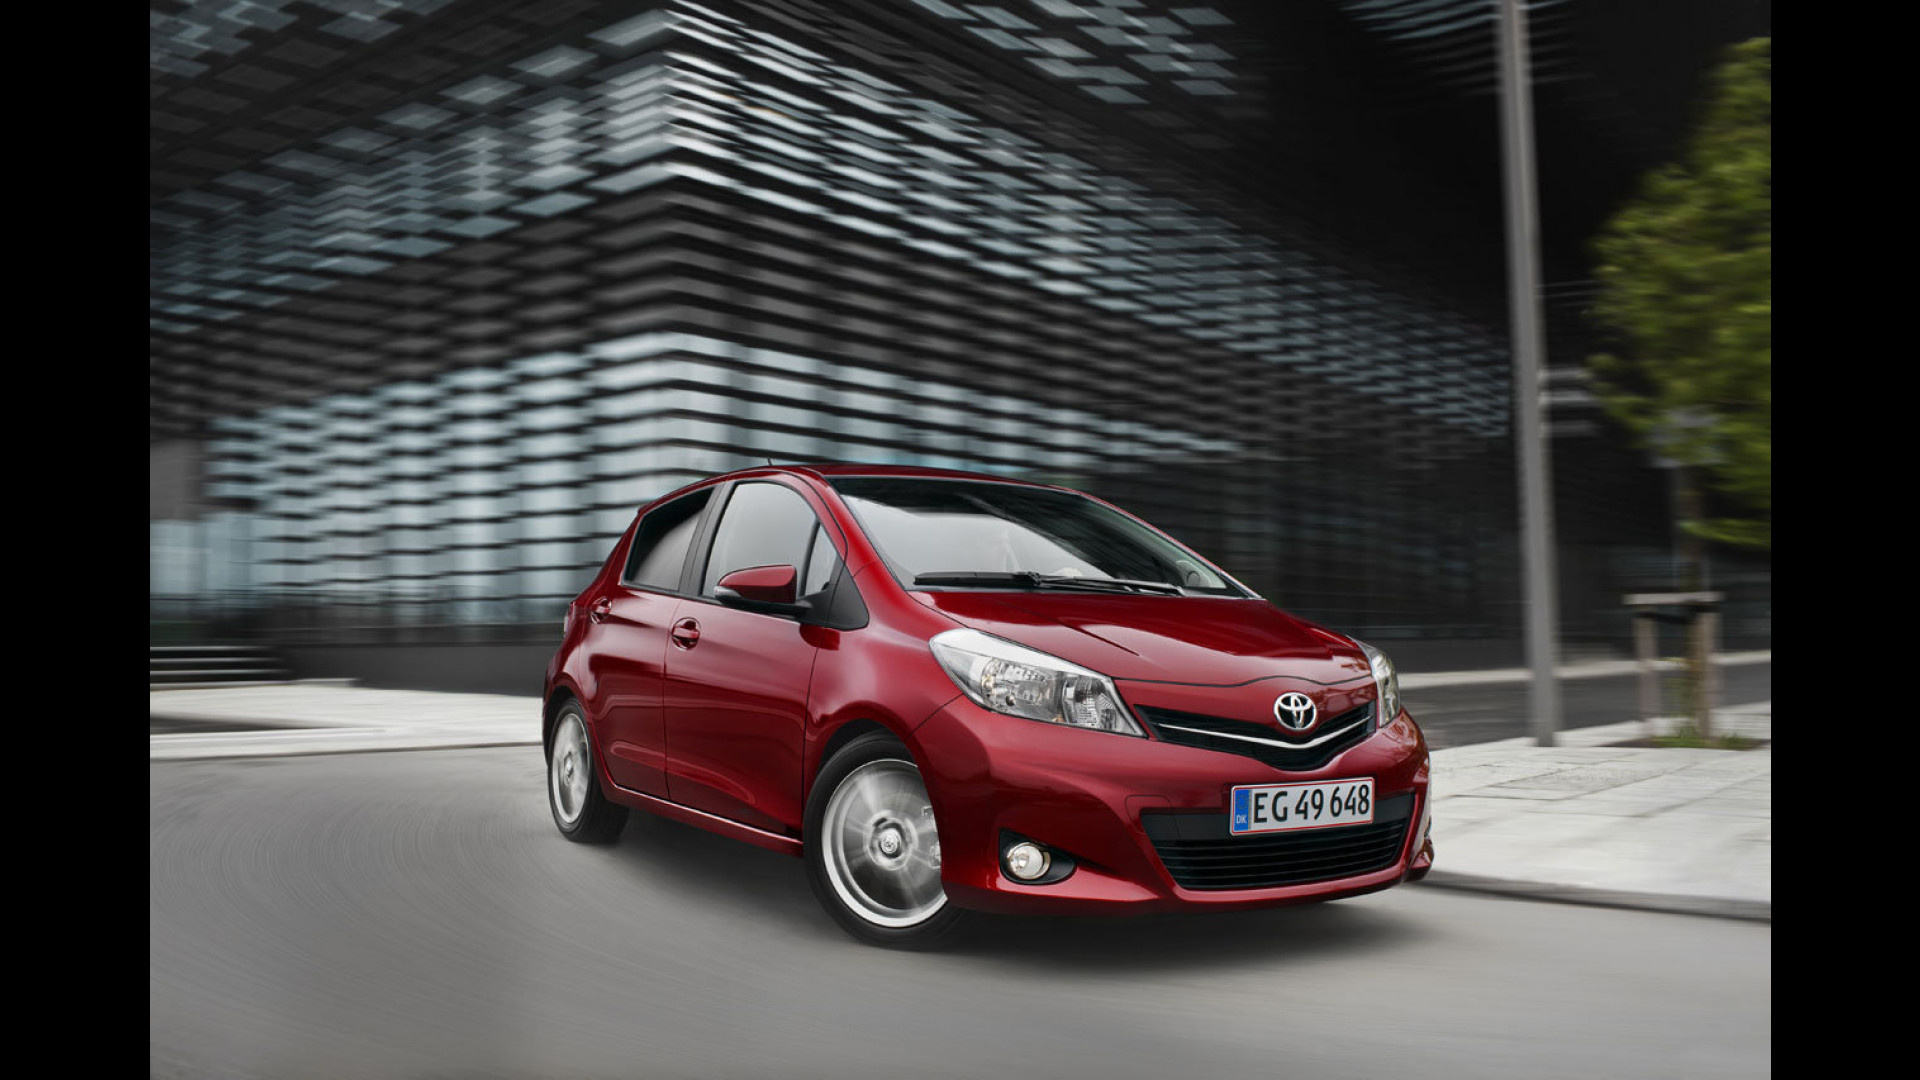 Schema Elettrico Yaris : Toyota yaris diversamente geniale